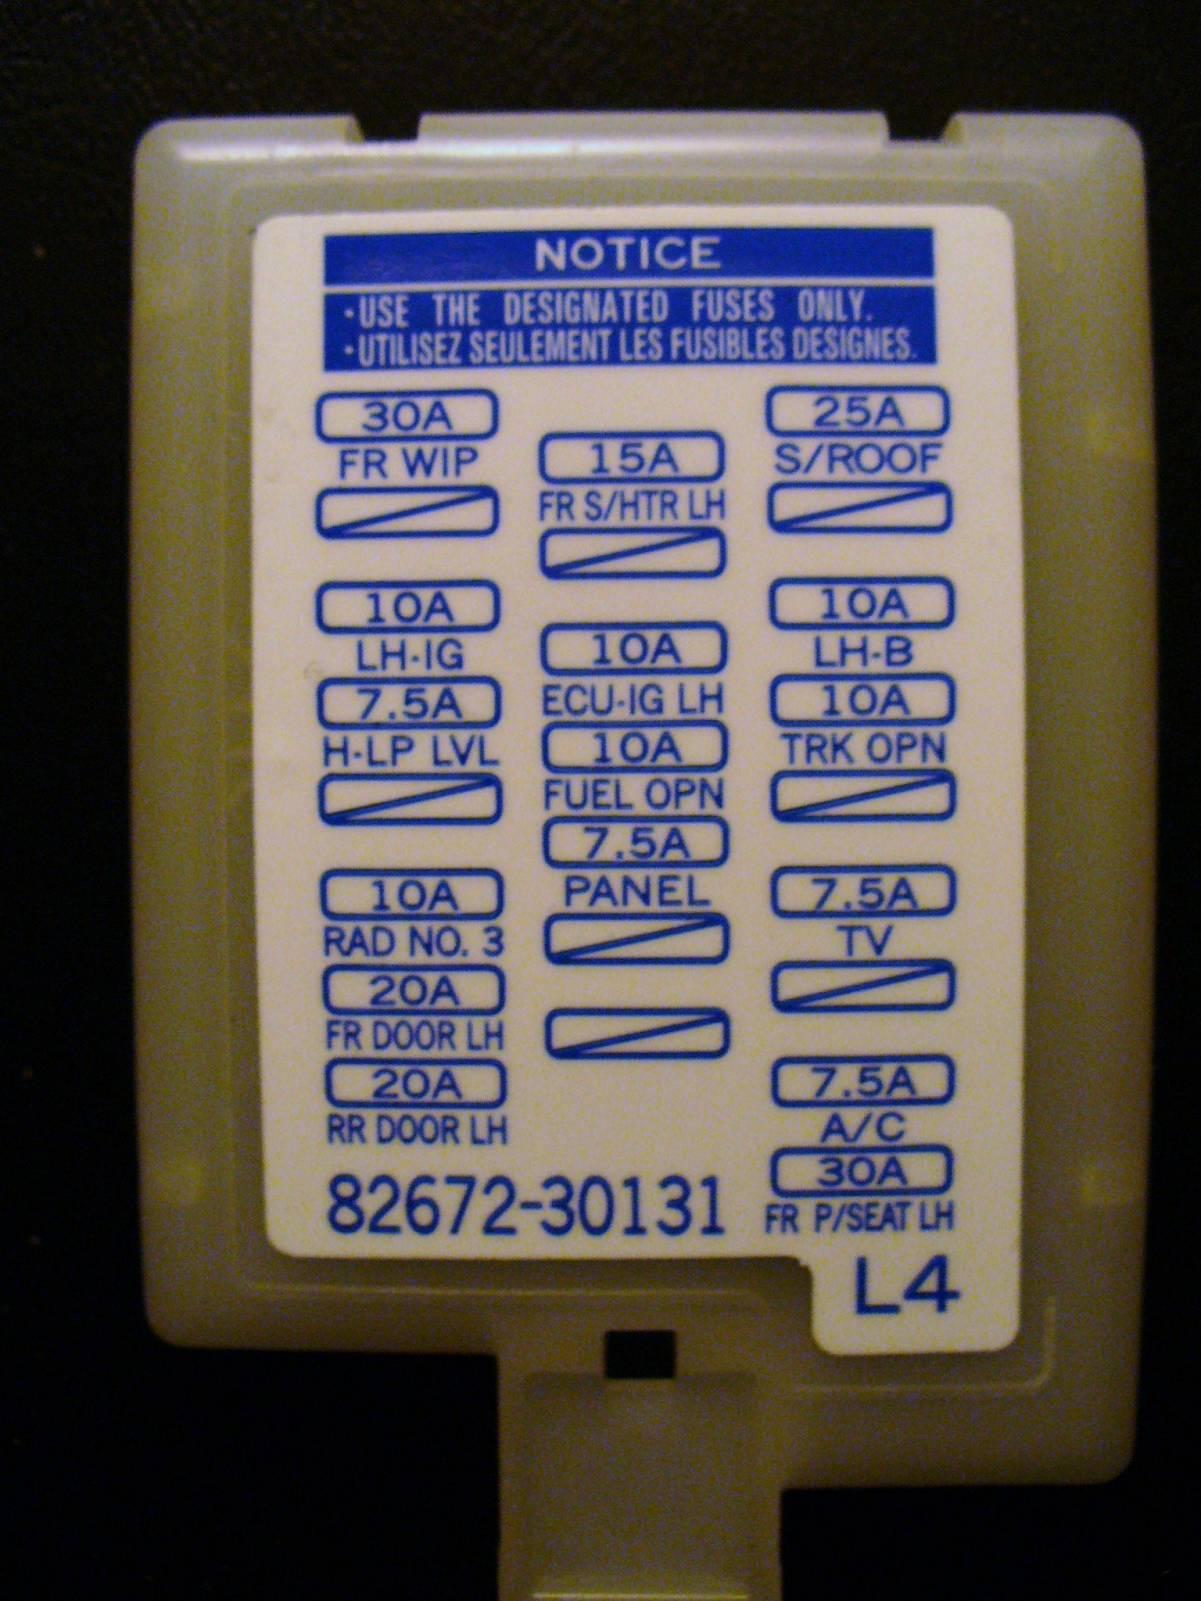 EH_1510] 95 Lexus Gs300 Fuse Box Diagram Download DiagramMopar Pneu Barep Unpr Oidei Basi Funi Stap Drosi Exmet Mohammedshrine  Librar Wiring 101